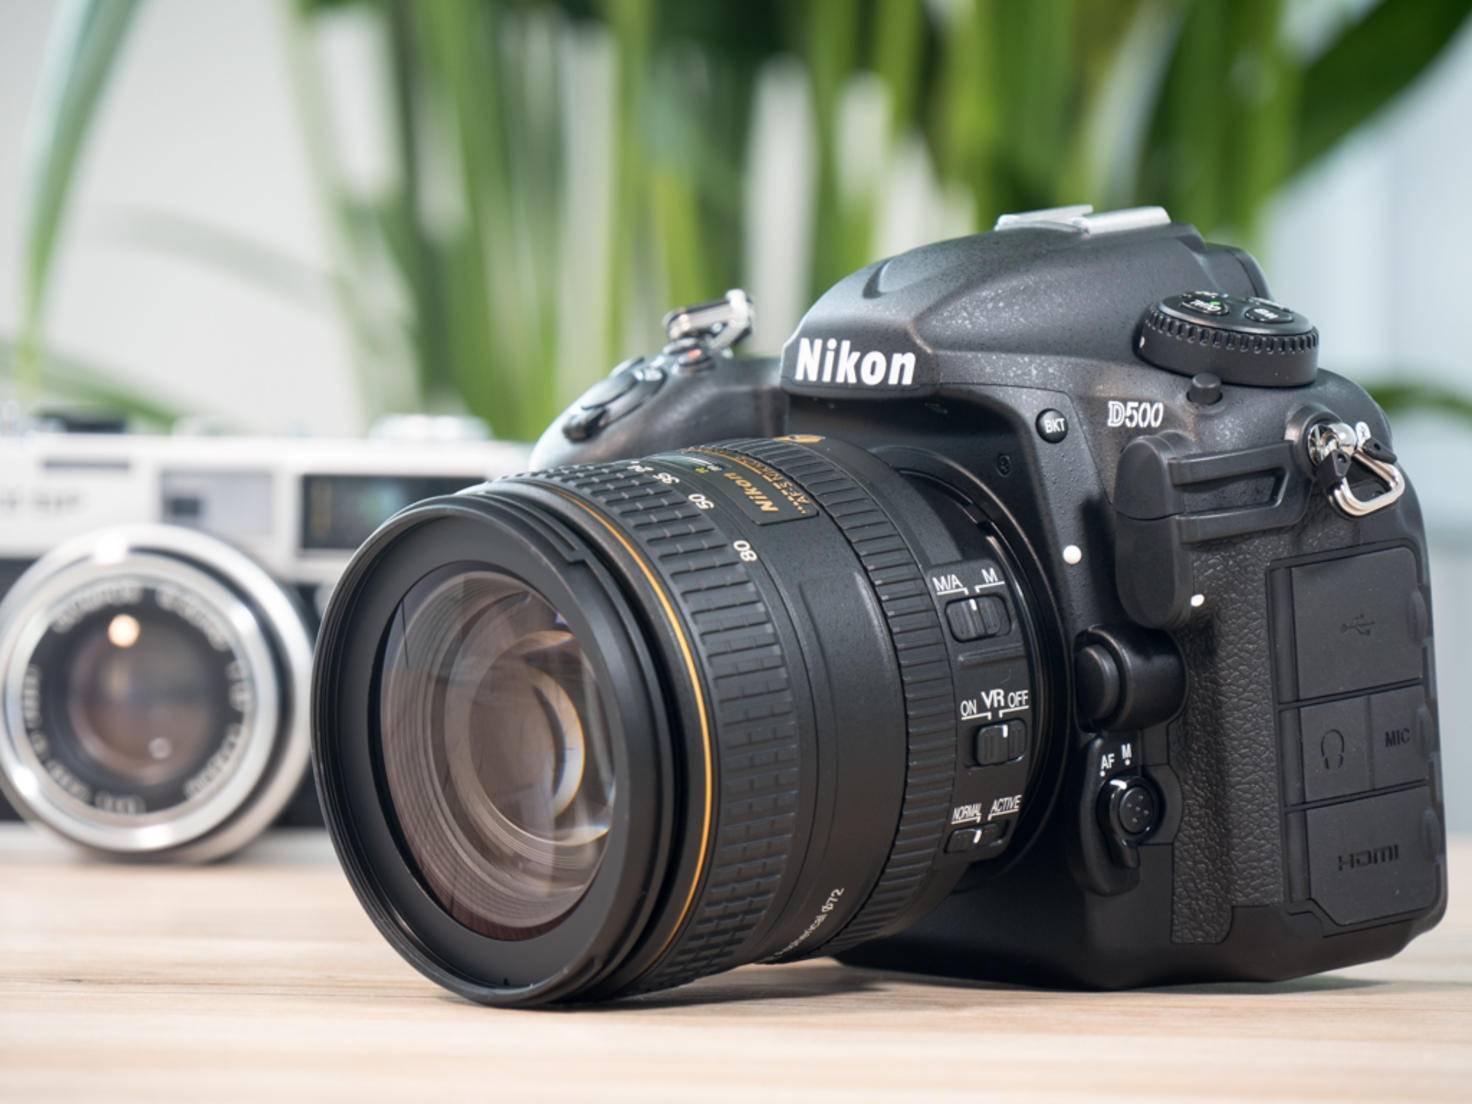 NikonD500